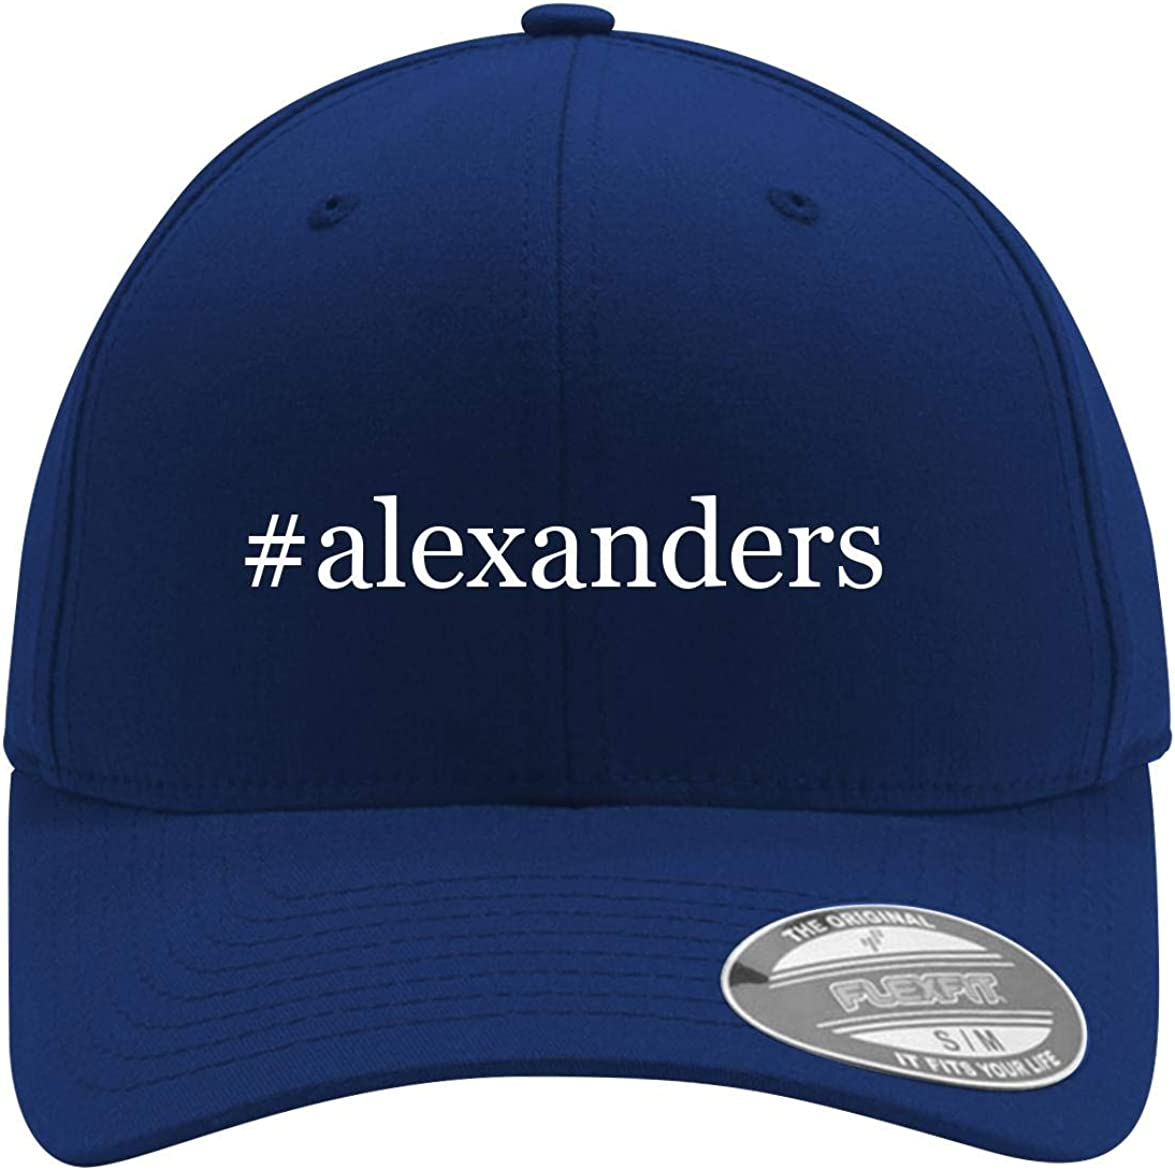 #alexanders - Adult Men's Hashtag Flexfit Baseball Hat Cap 61R9XR3gZyL